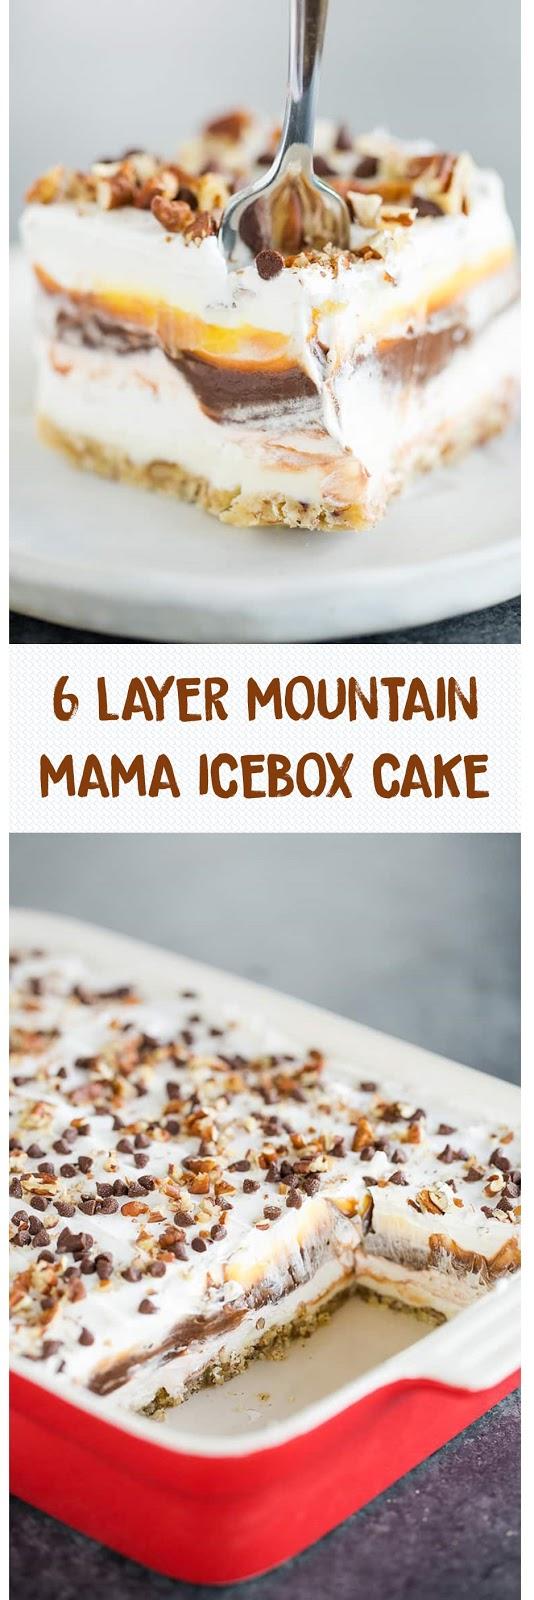 6 LAYER MOUNTAIN MAMA ICEBOX CAKE